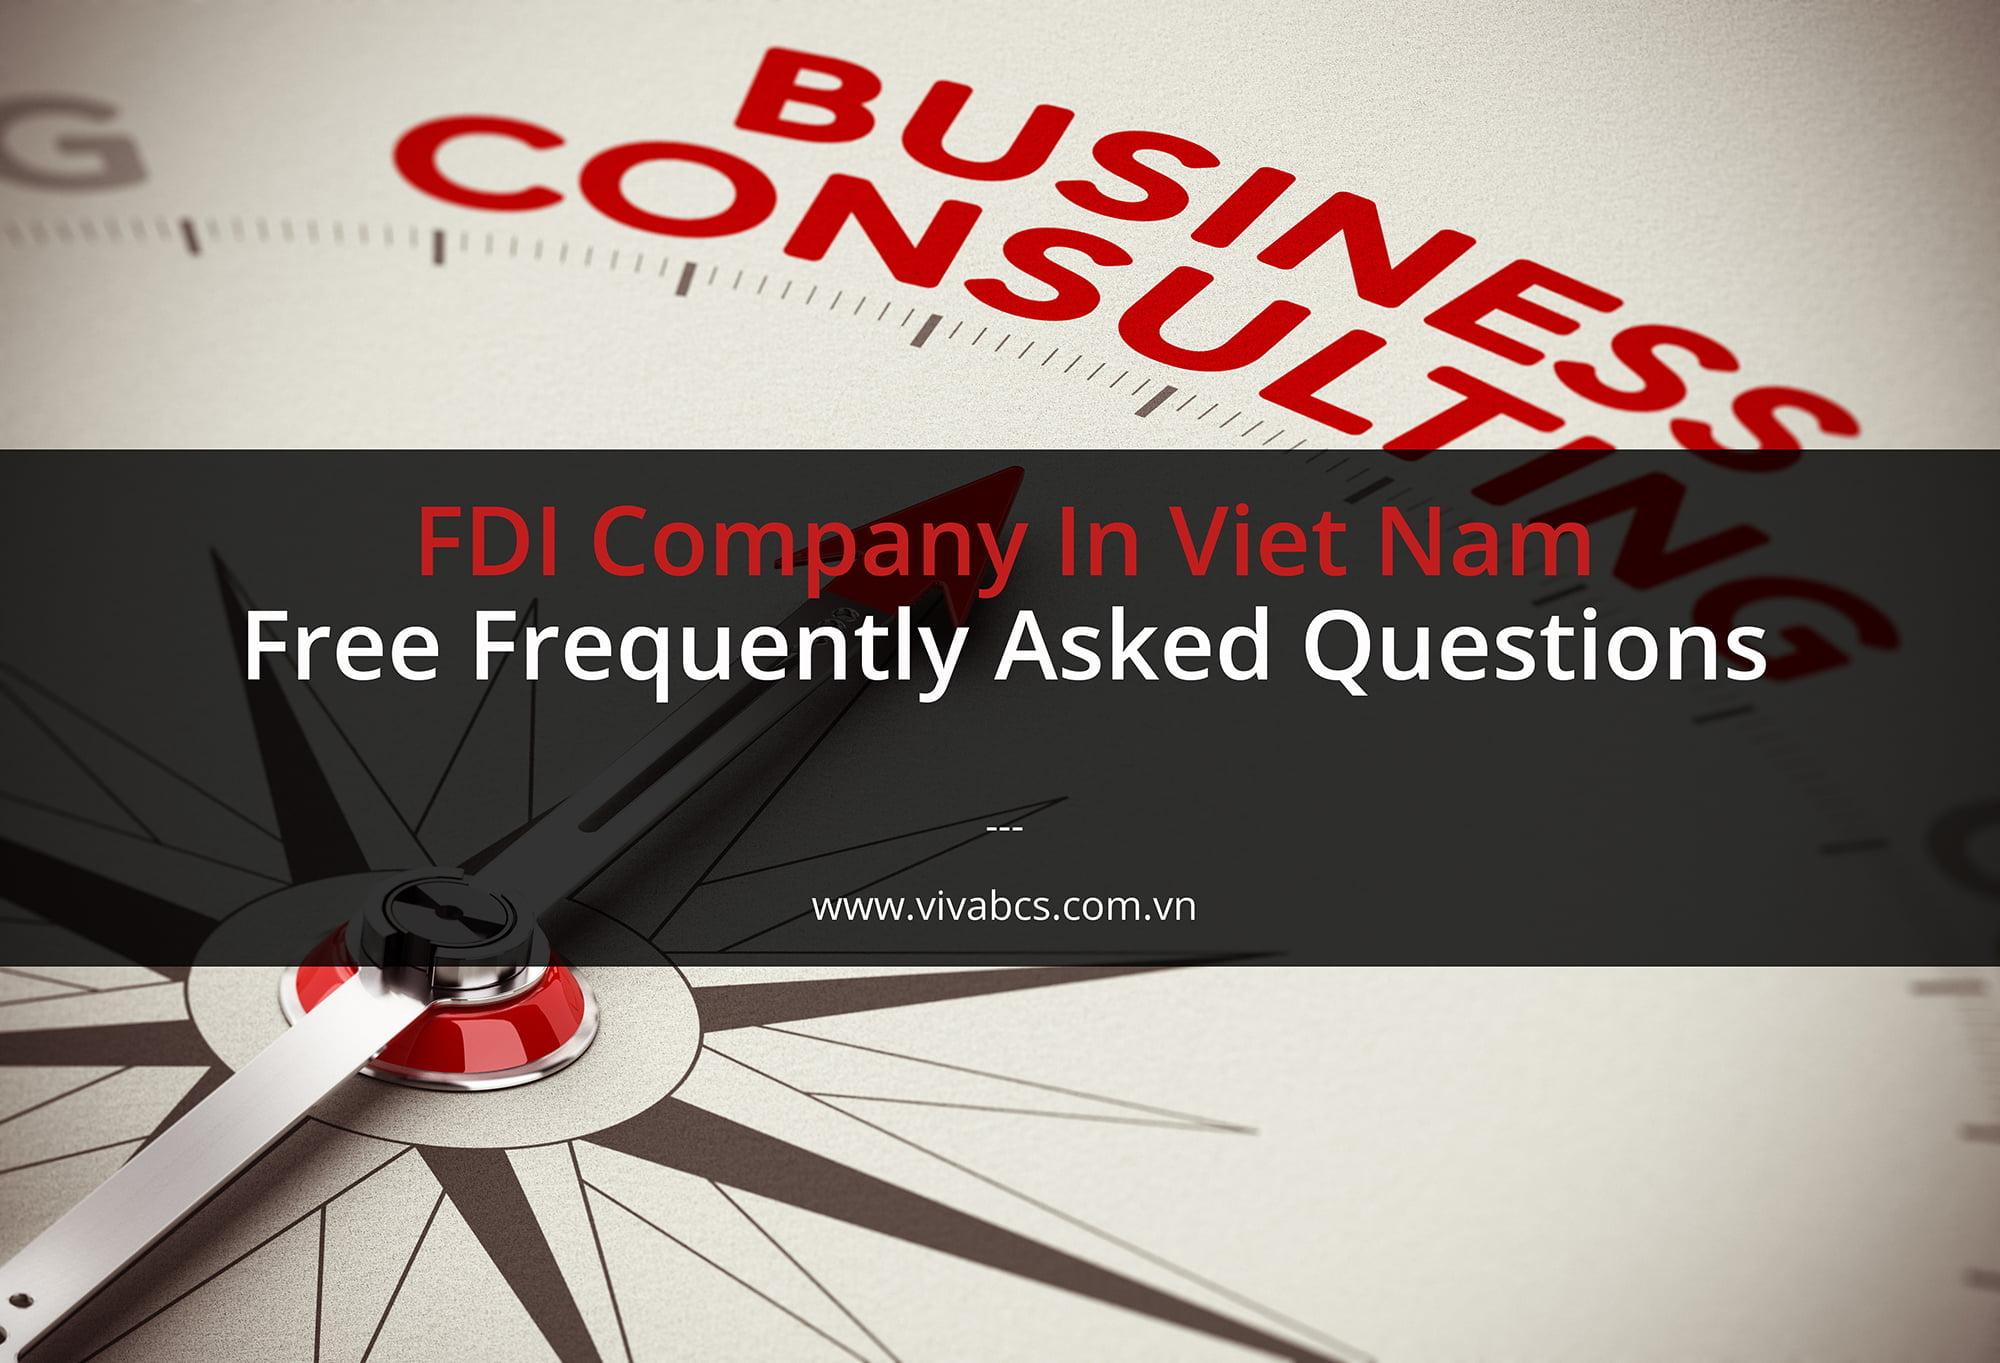 fdi companies